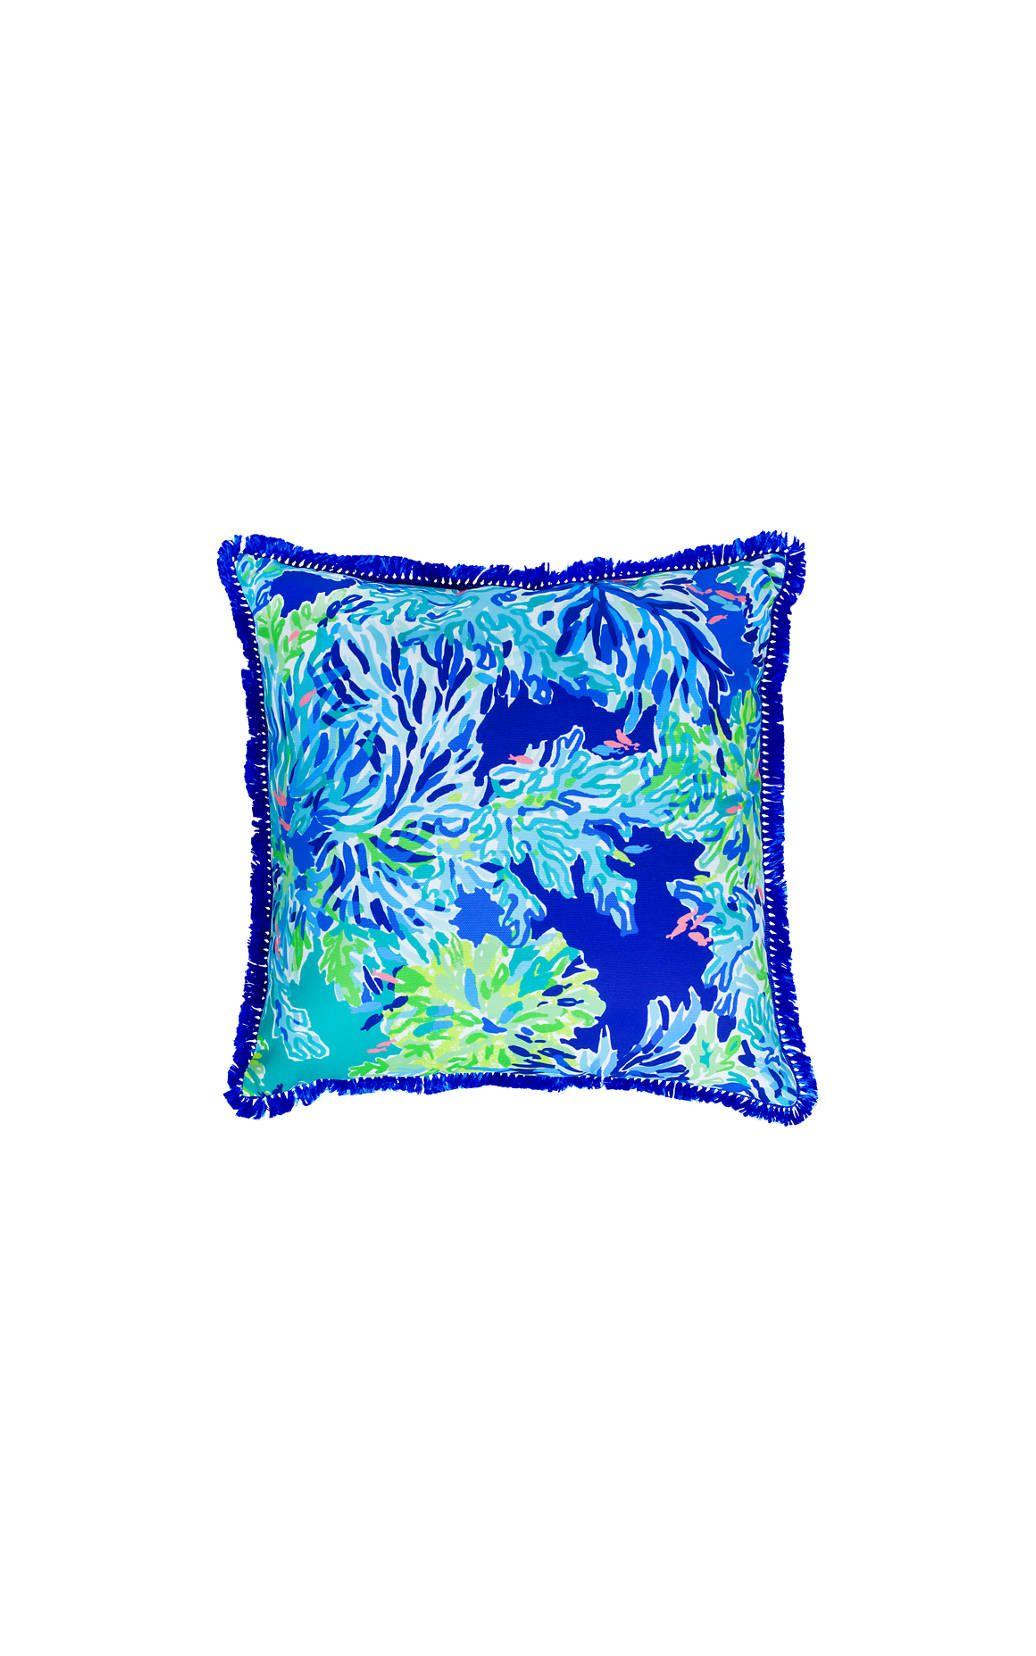 f8e99c8d566a1f Large Indoor/Outdoor Pillow | home decor | Large pillows, Pillows ...